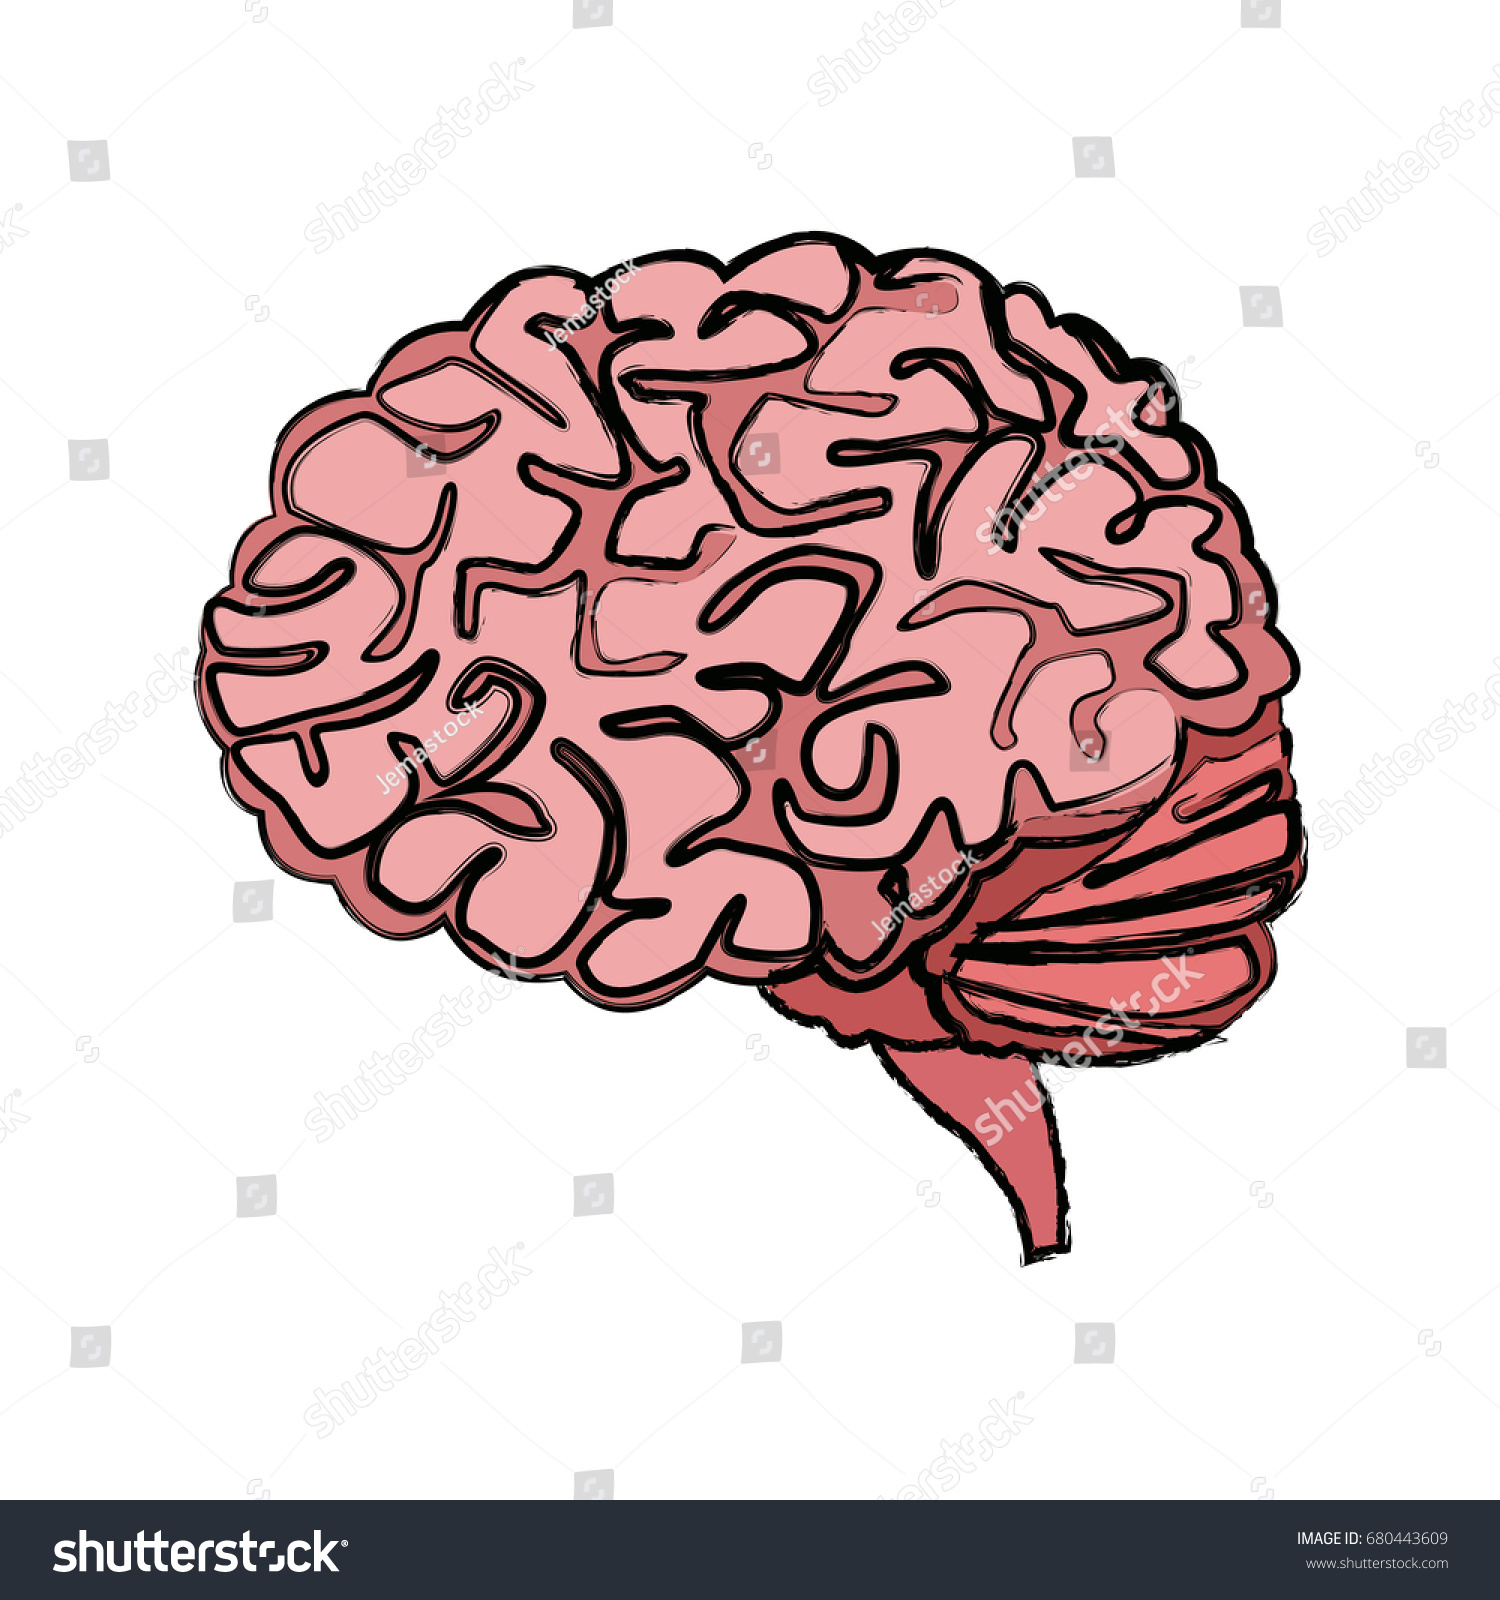 Human Brain Medical Healthy Memory Anatomy Stock Vector 680443609 ...